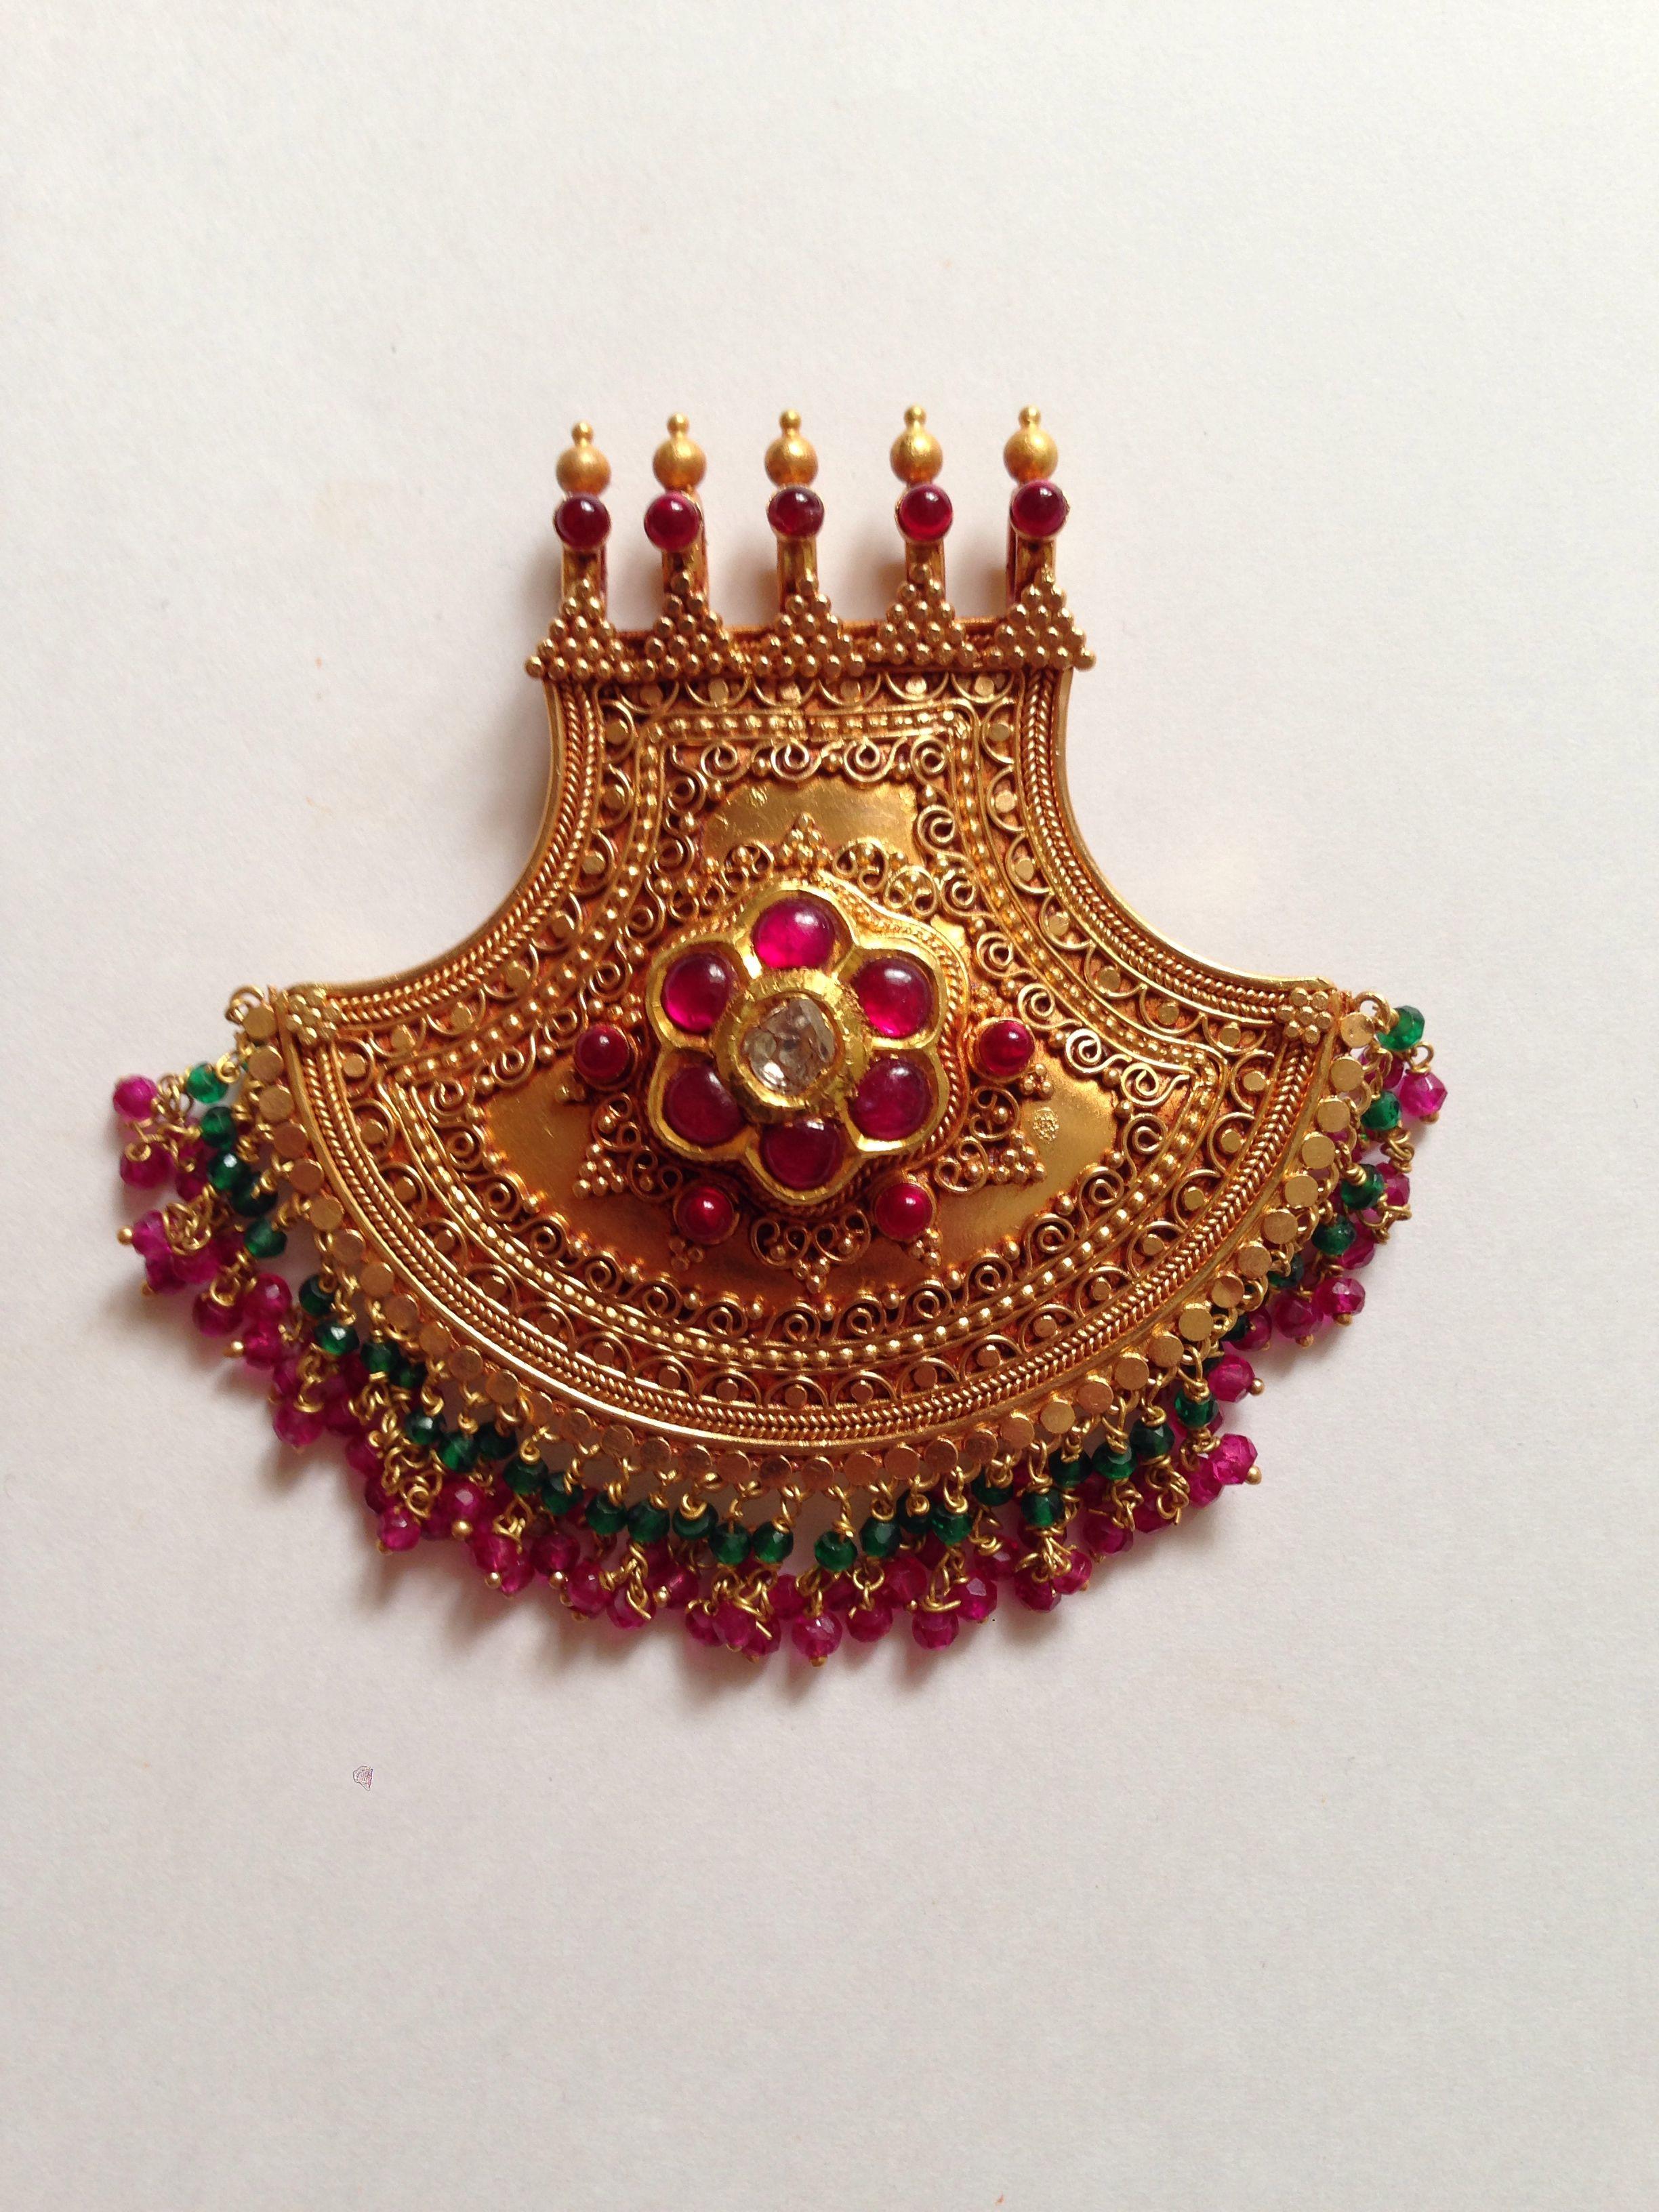 Antique pendant goldjewellery n art pieces pinterest